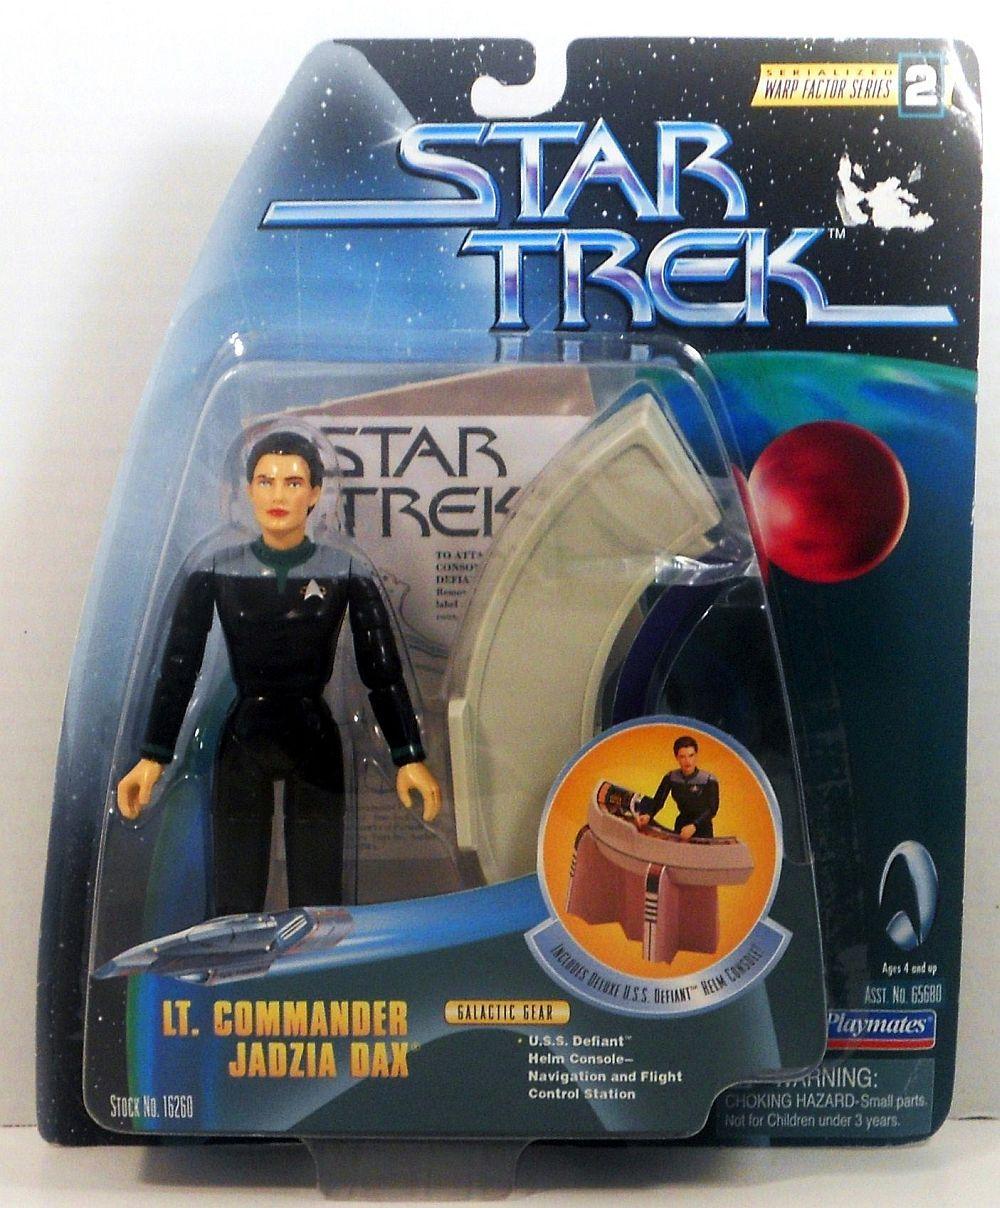 Image 0 of Star Trek DS9 Lieutenant Jadzia Dax Warp Factor Series 2